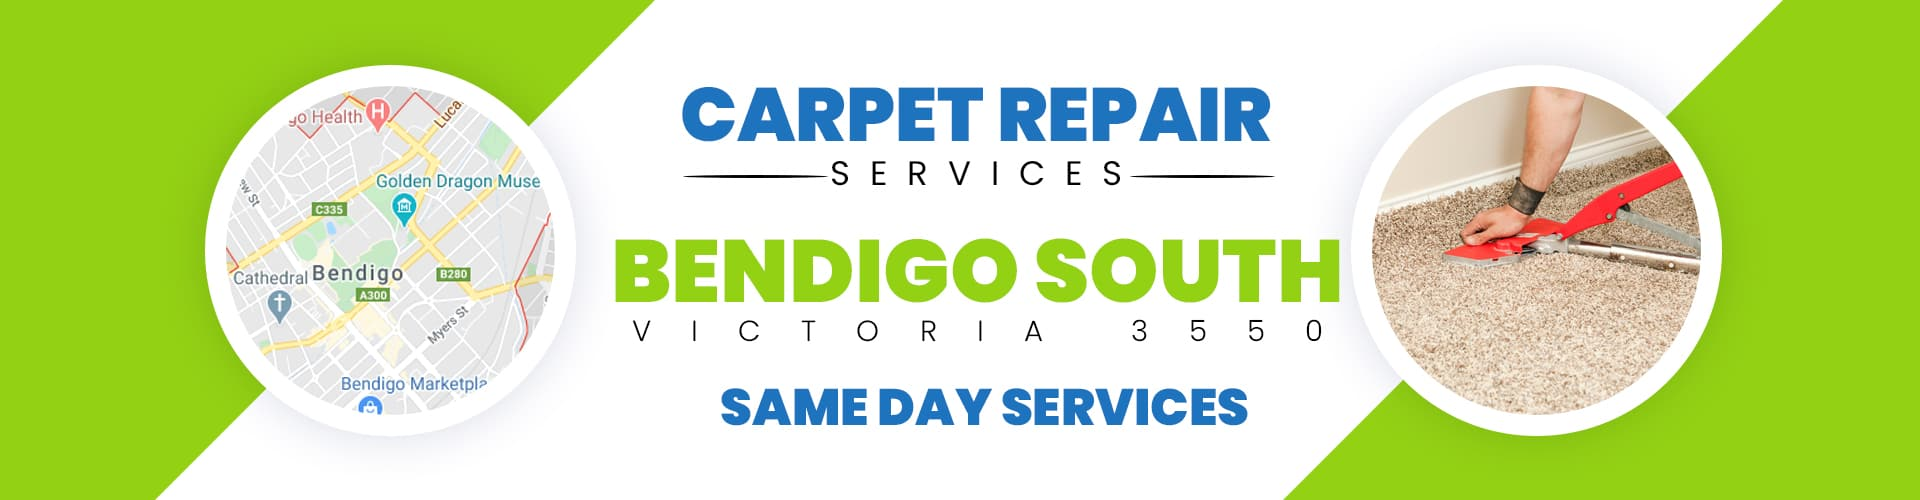 Carpet Repair Bendigo South